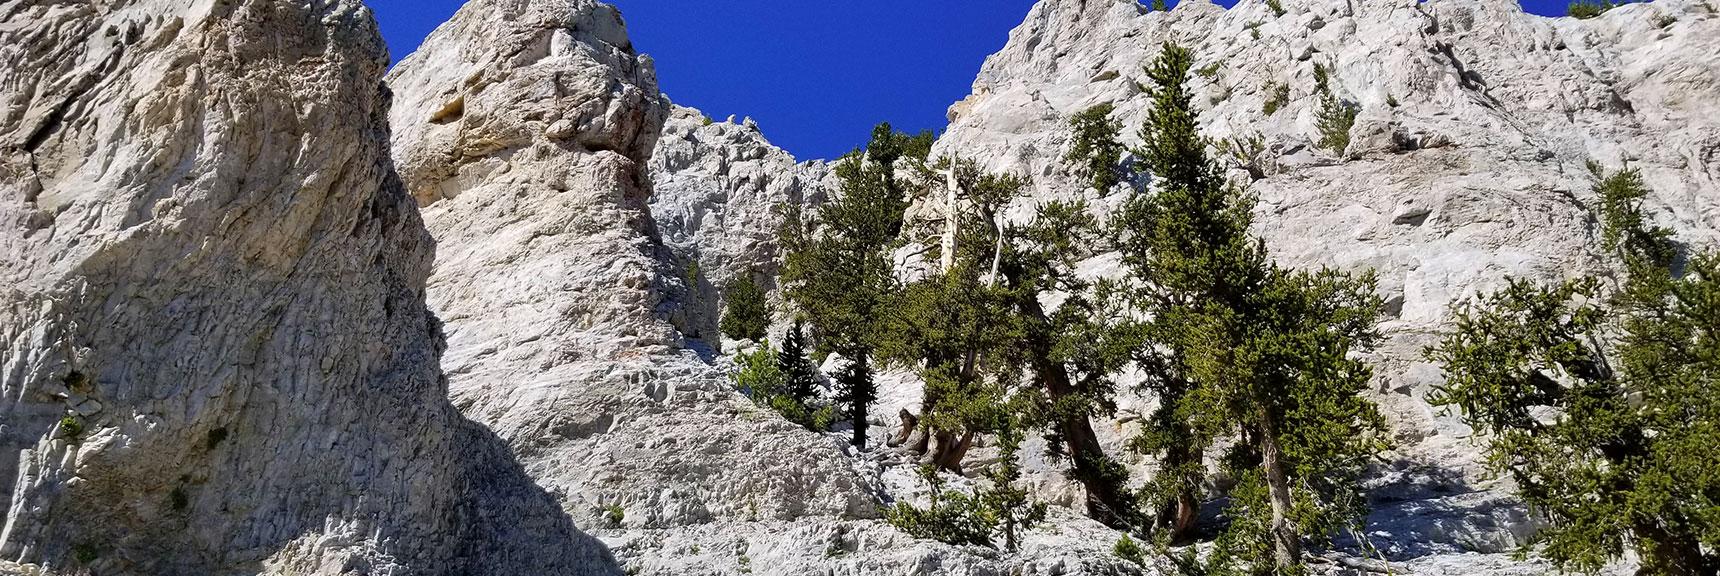 Entering Mummy's False Summit Approach Canyon, Nevada